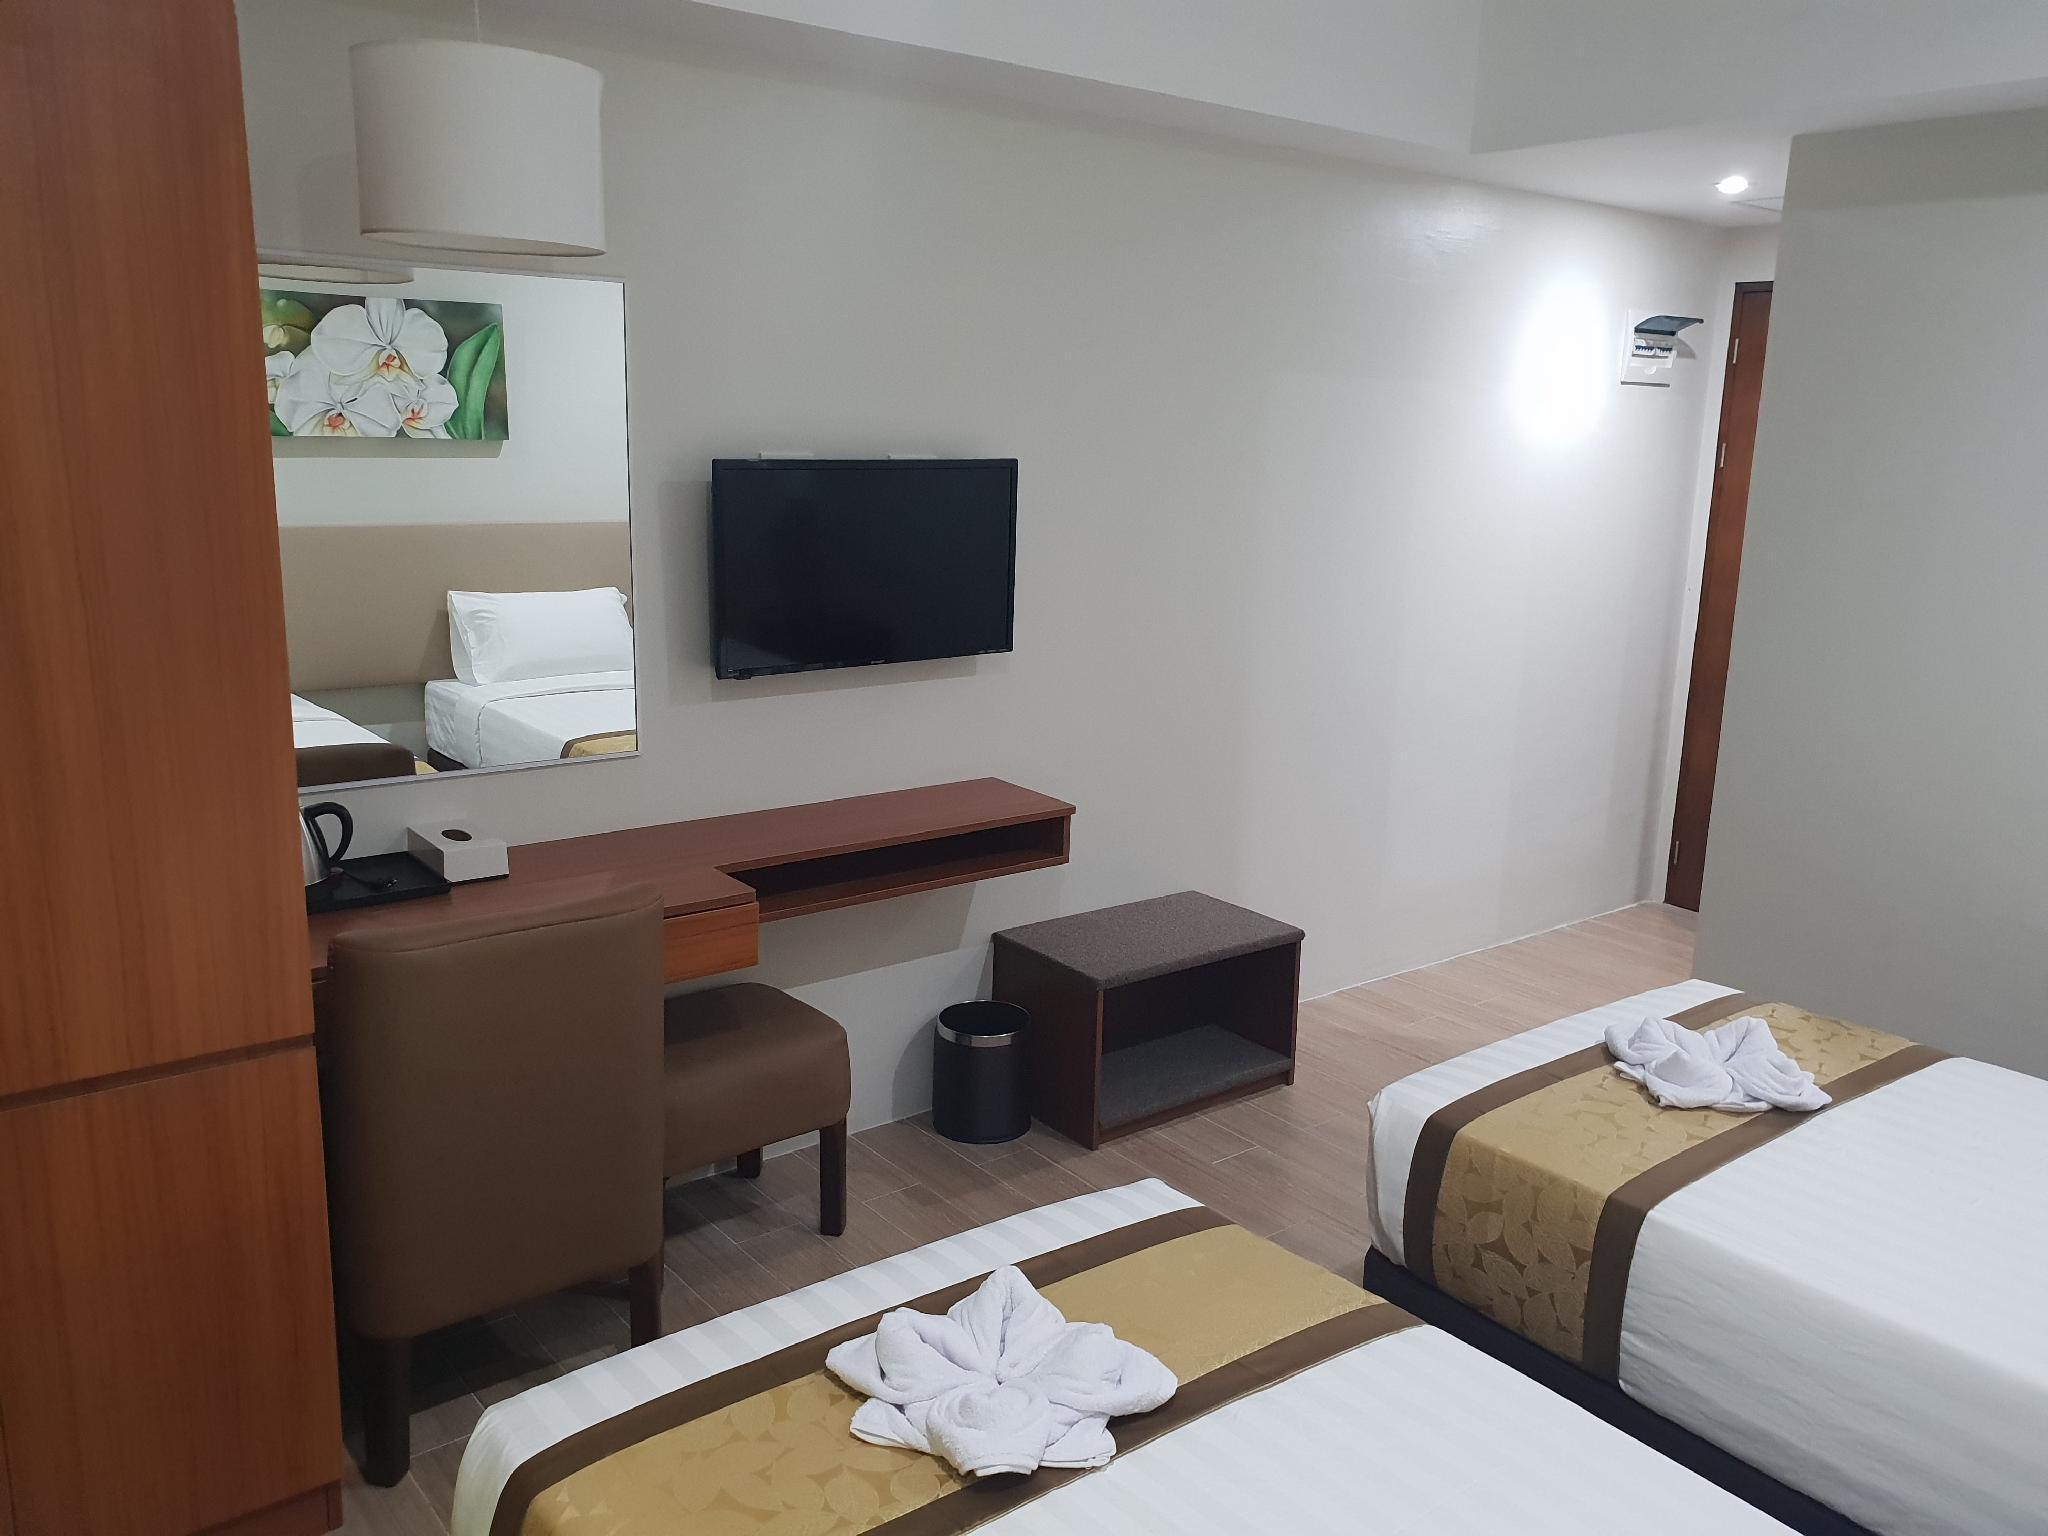 Hotel Fleur de Liz, Tagbilaran City